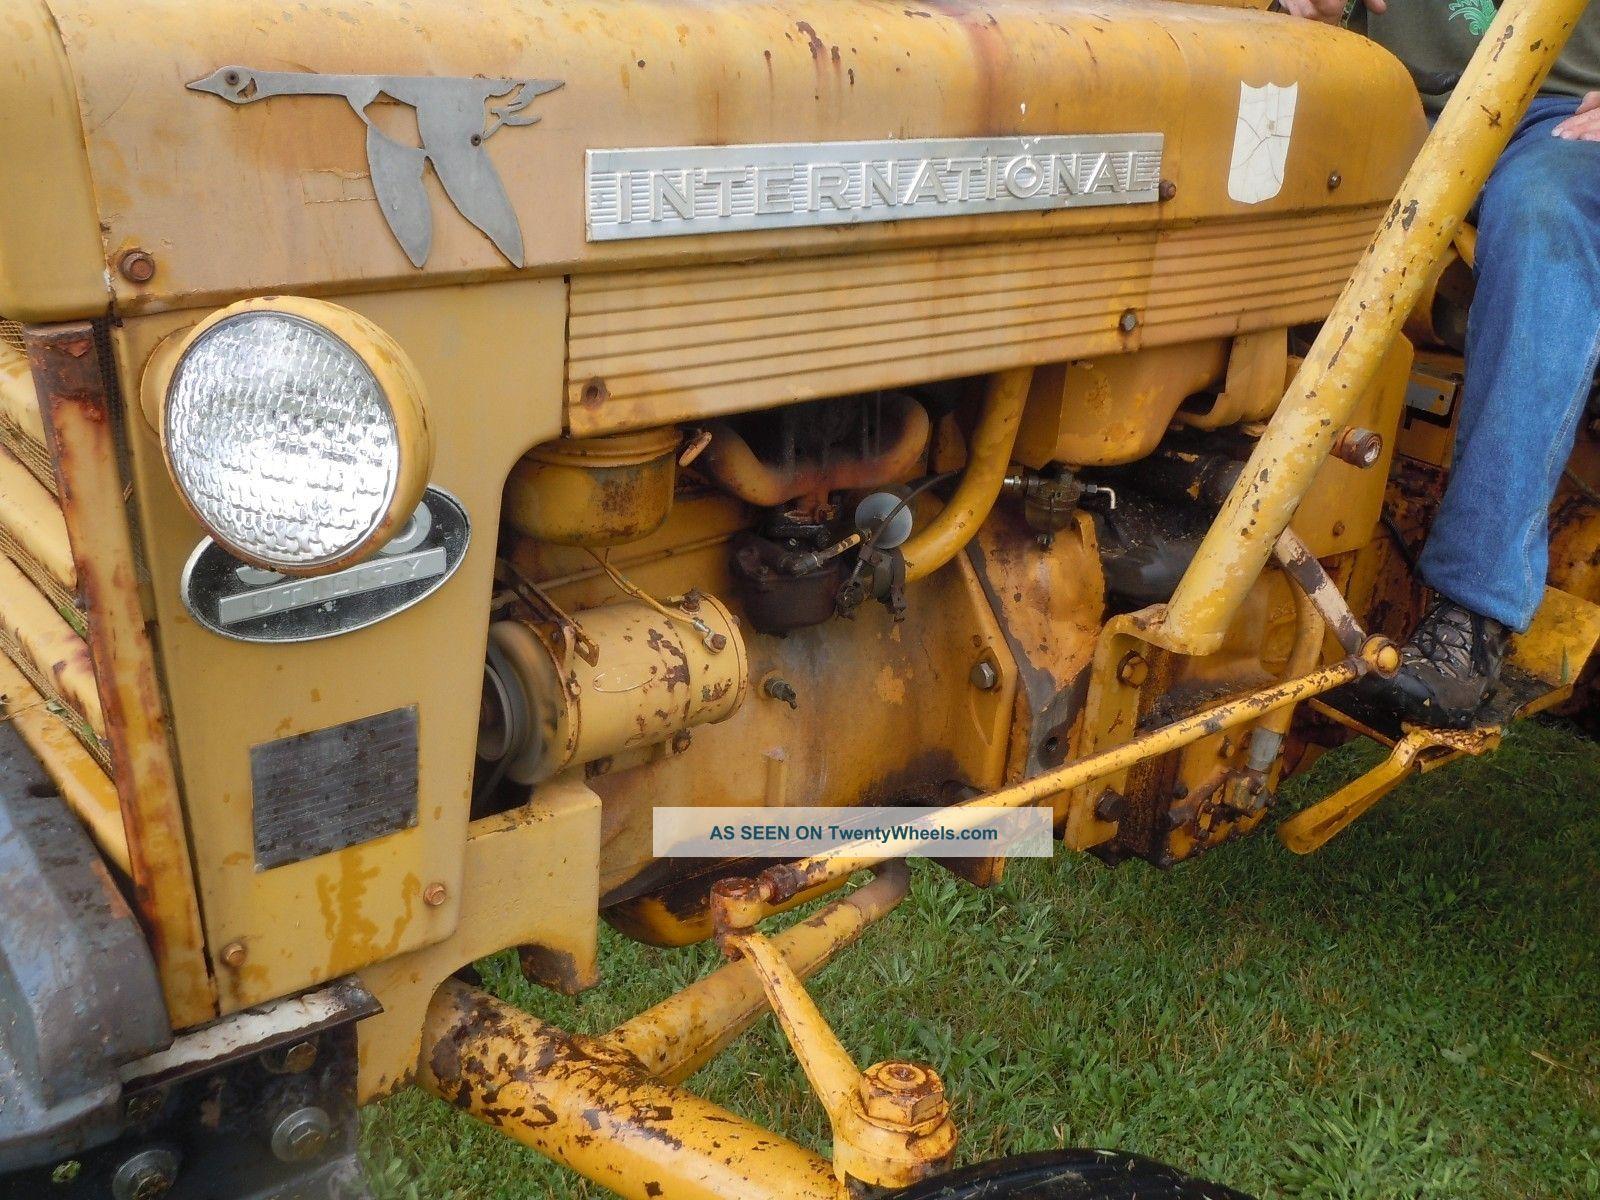 1960 340 International Utility Tractor : International industrial tractor  bush hog mower